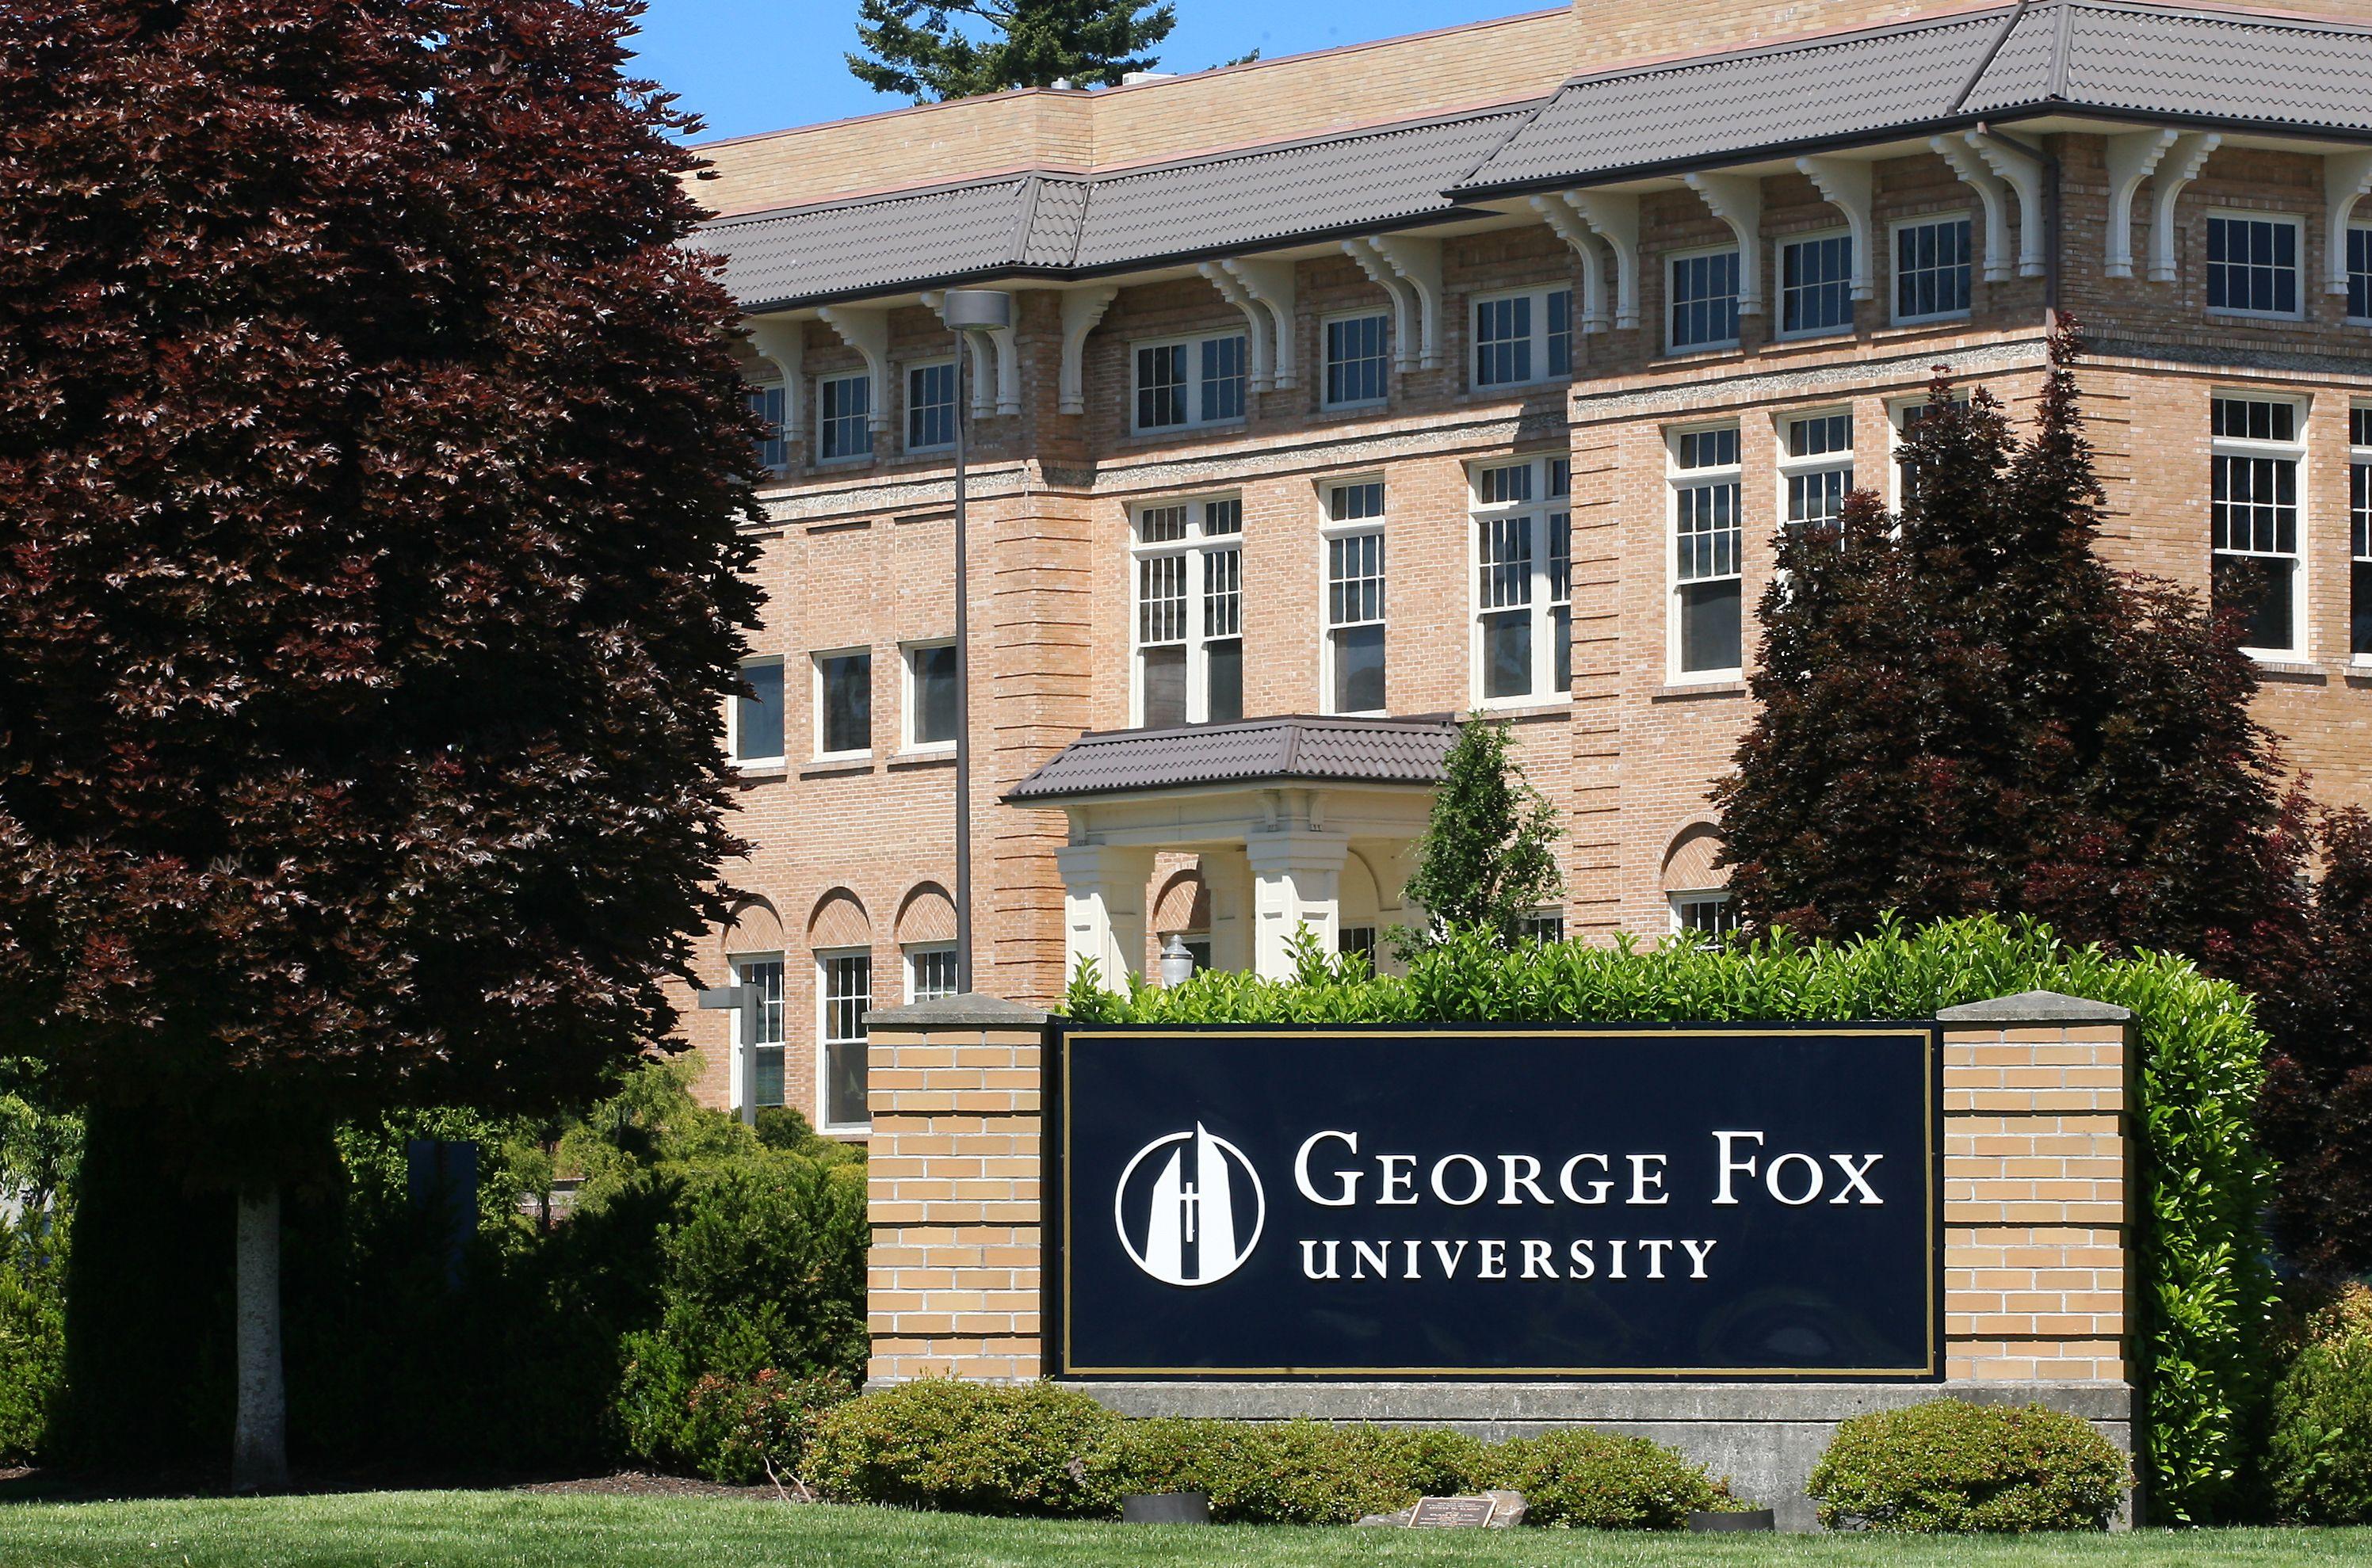 5d3250bae67fed49a80ae437c7e9dc04 - University Of Oregon Housing Application Deadline